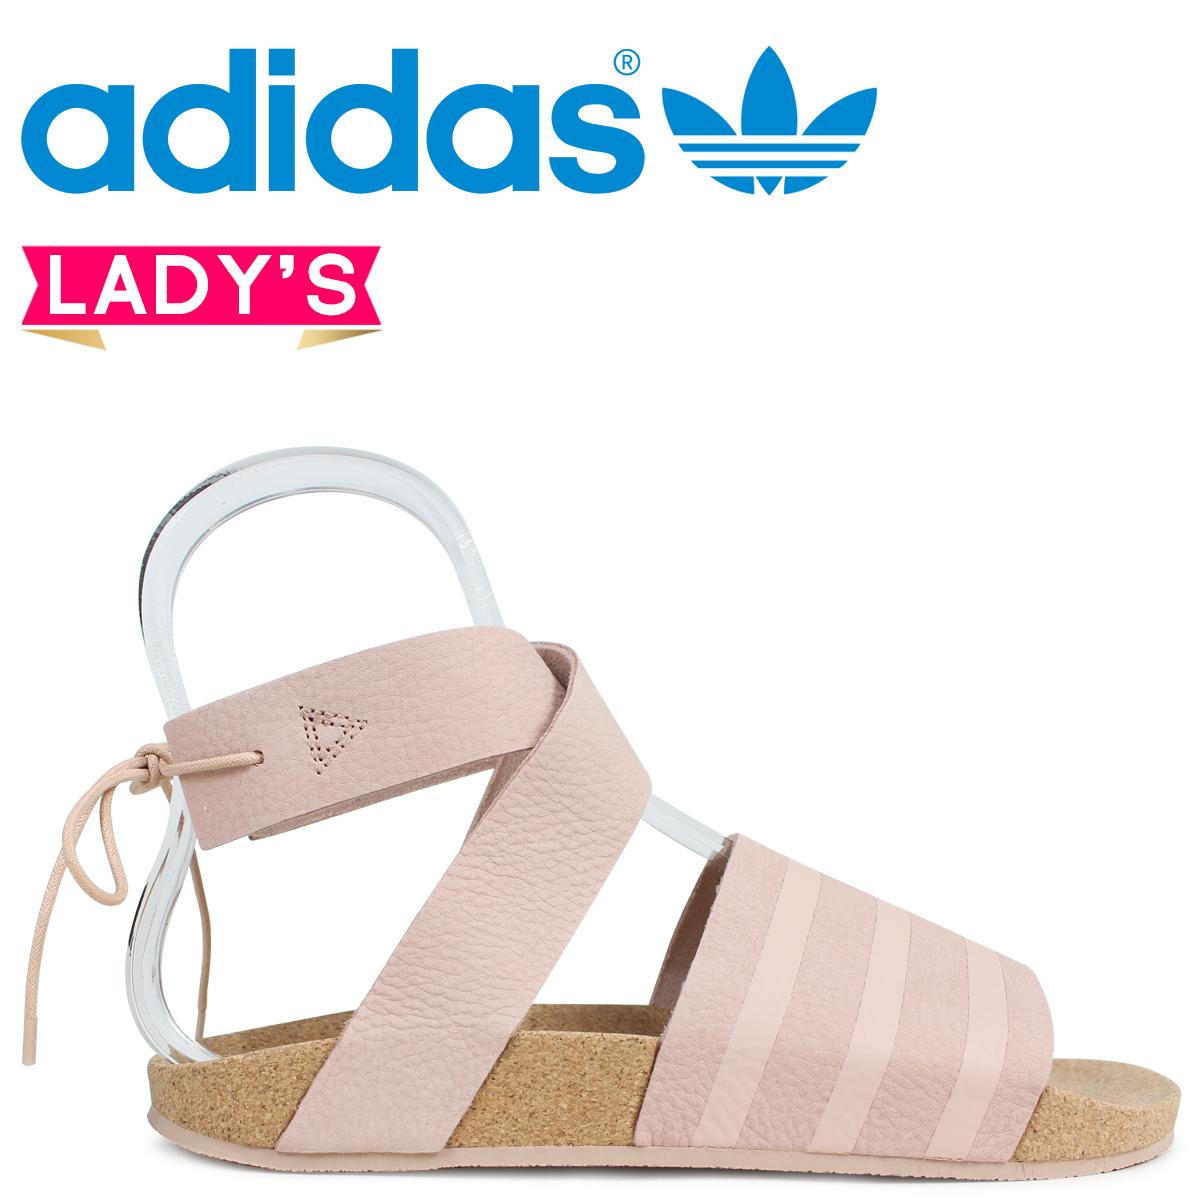 adidas Originals アディレッタ アディダス レディース サンダル ADILETTE ANKLE WRAP W CM8168 ピンク オリジナルス